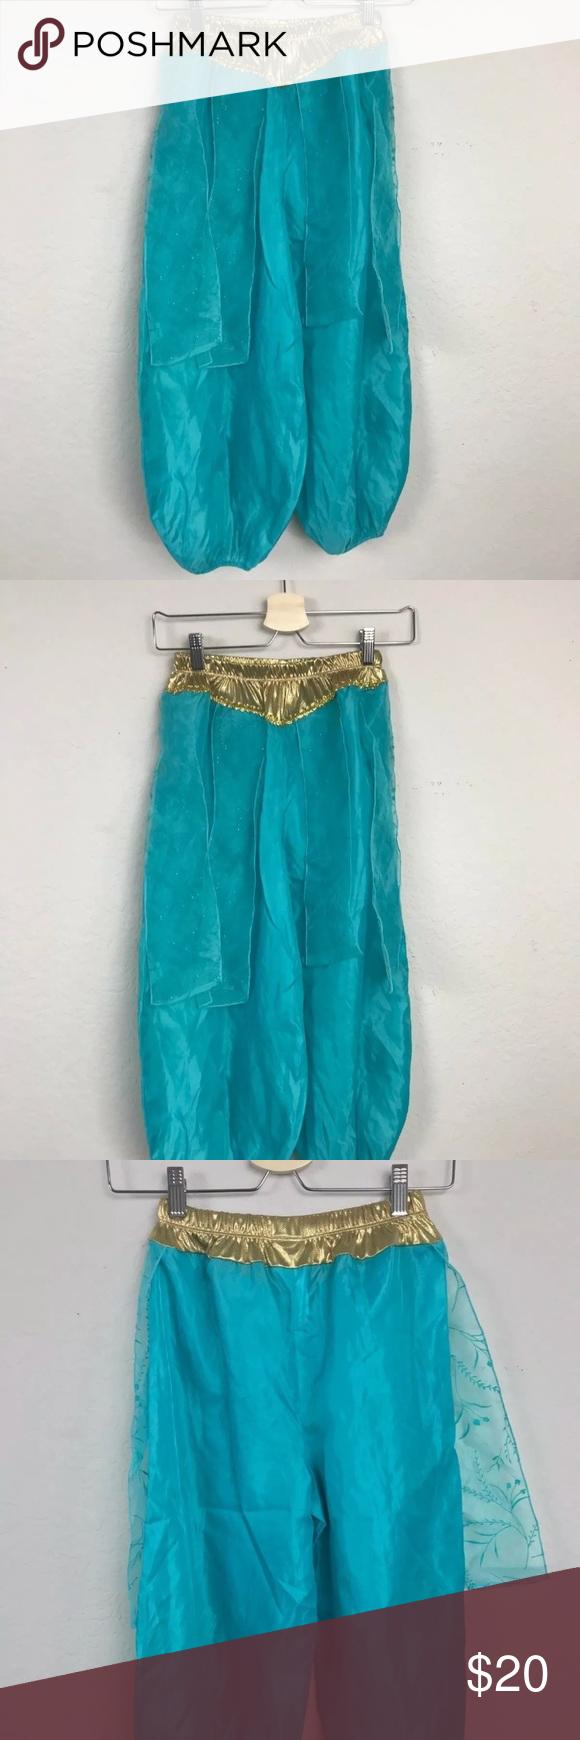 Disney pant costume jasmine aladdin sz m my posh closet